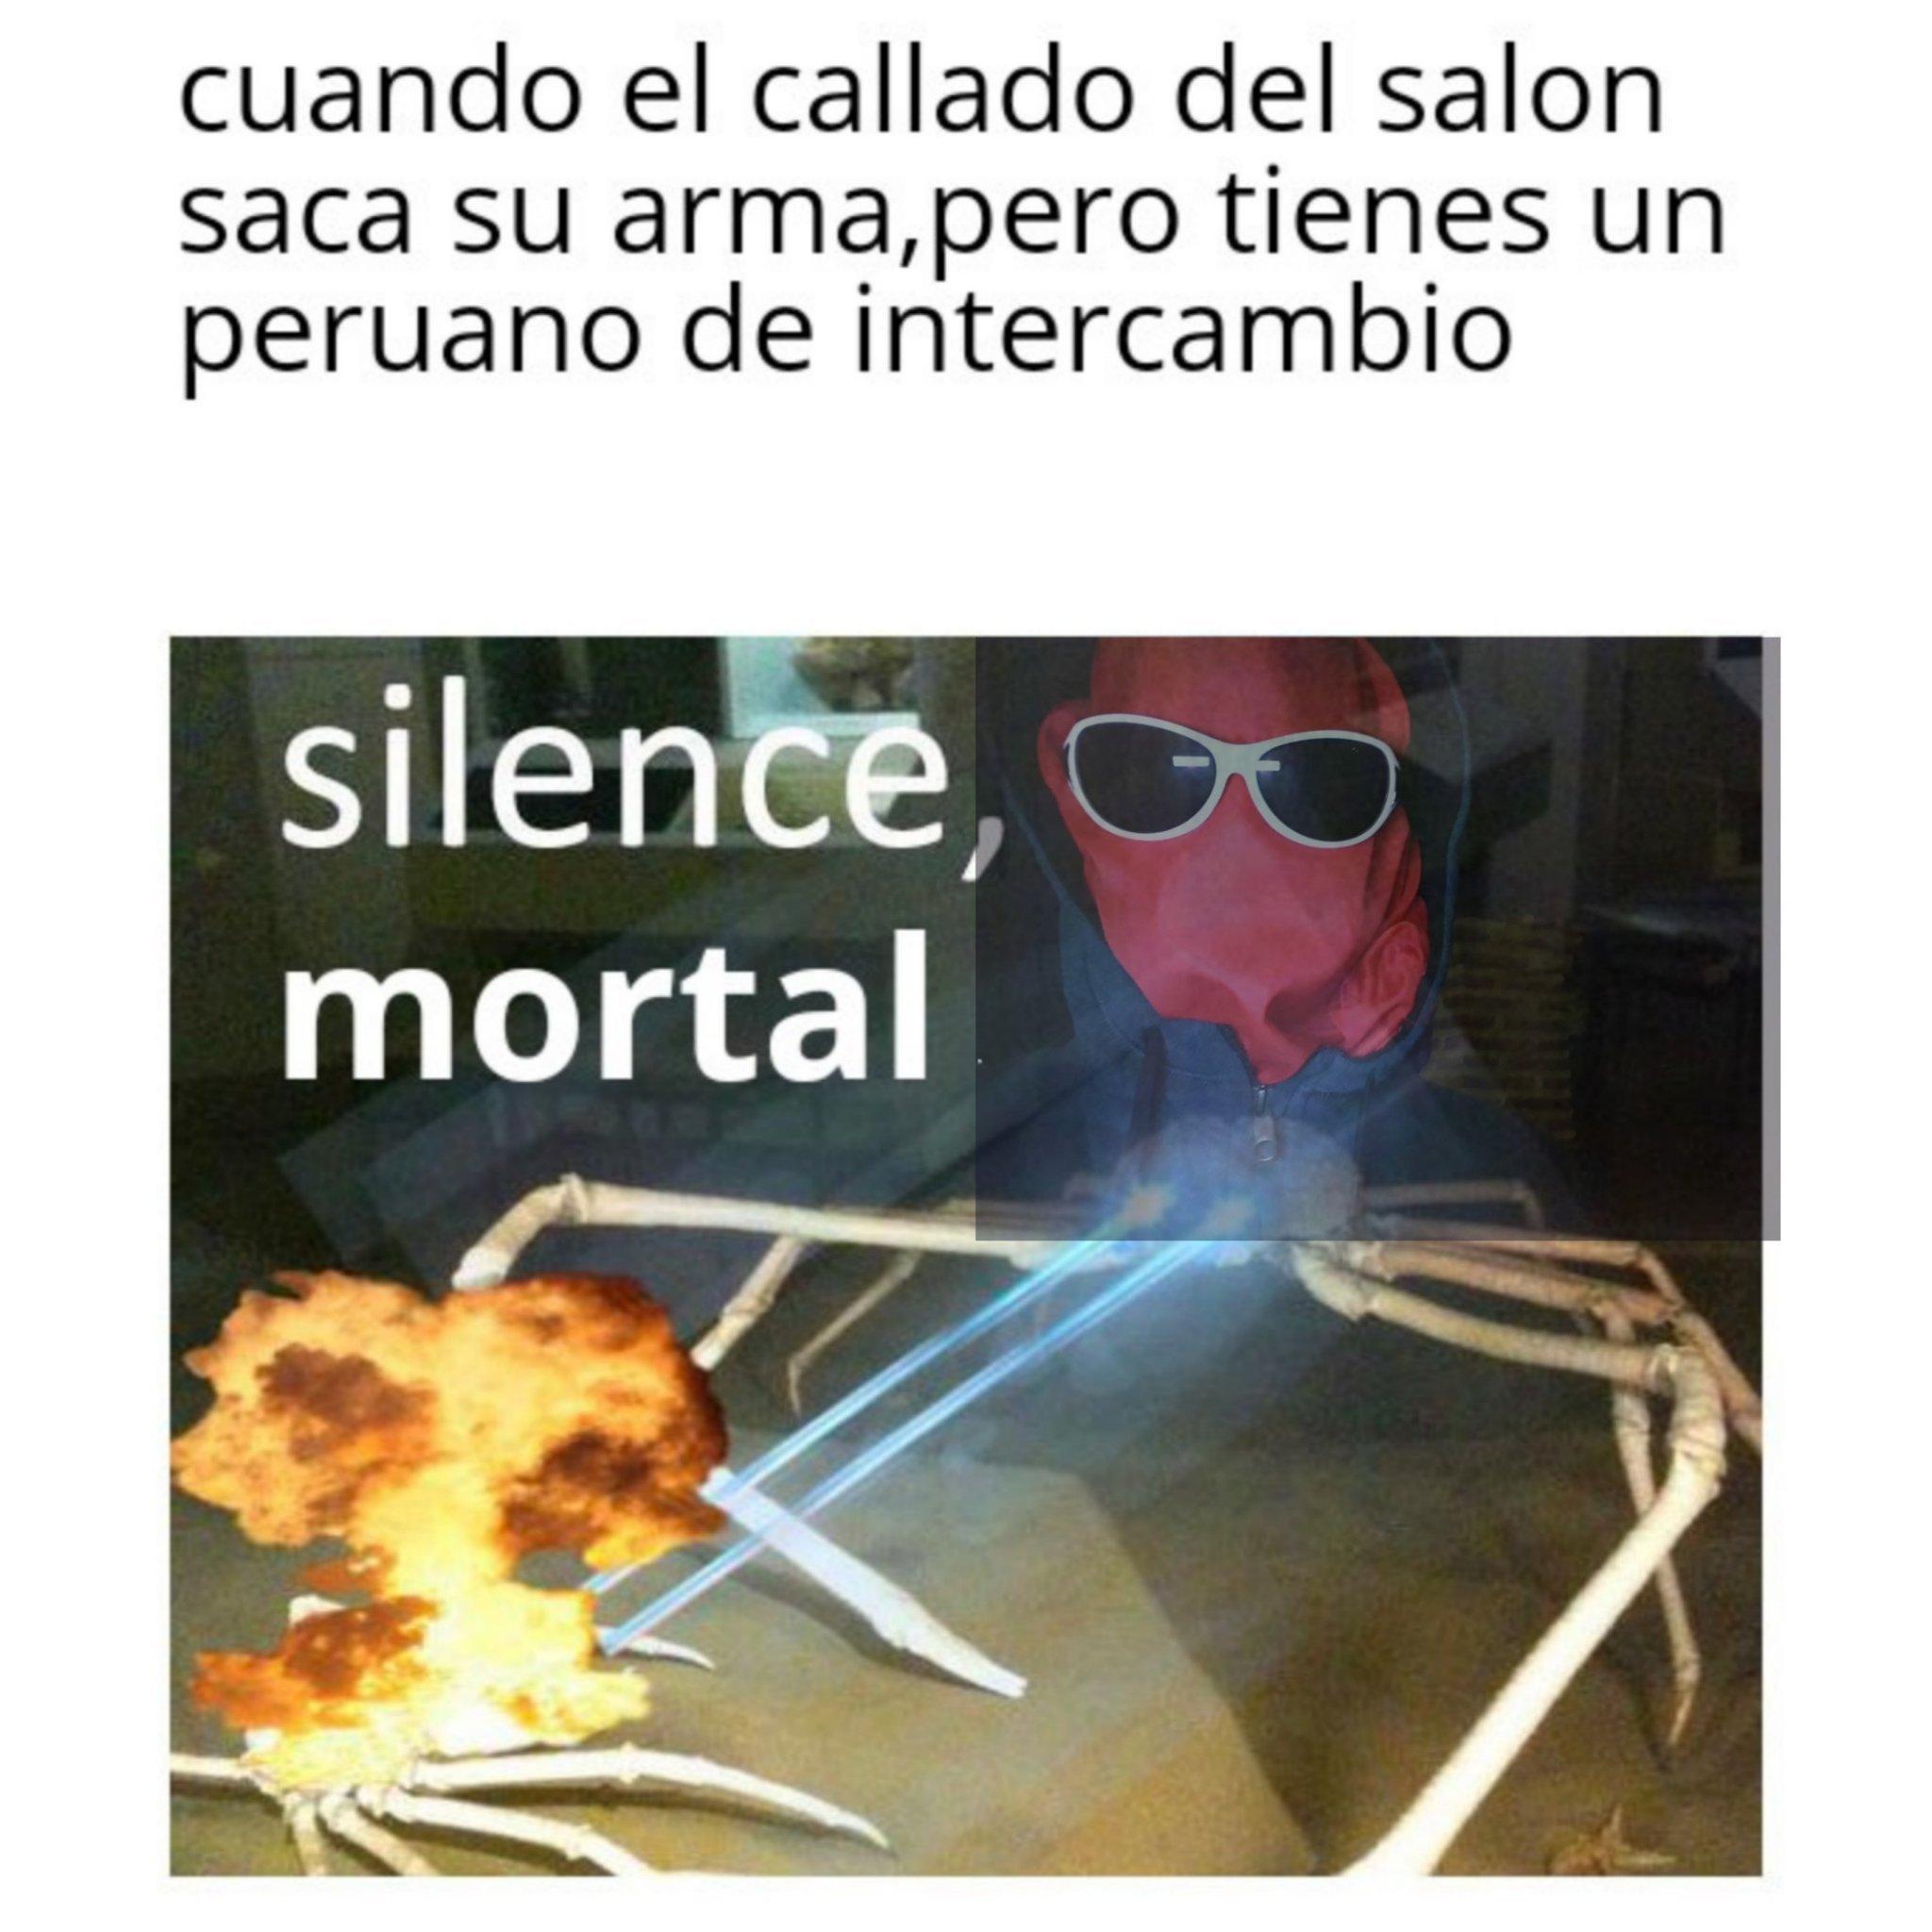 Peruanos,una raza superior - meme